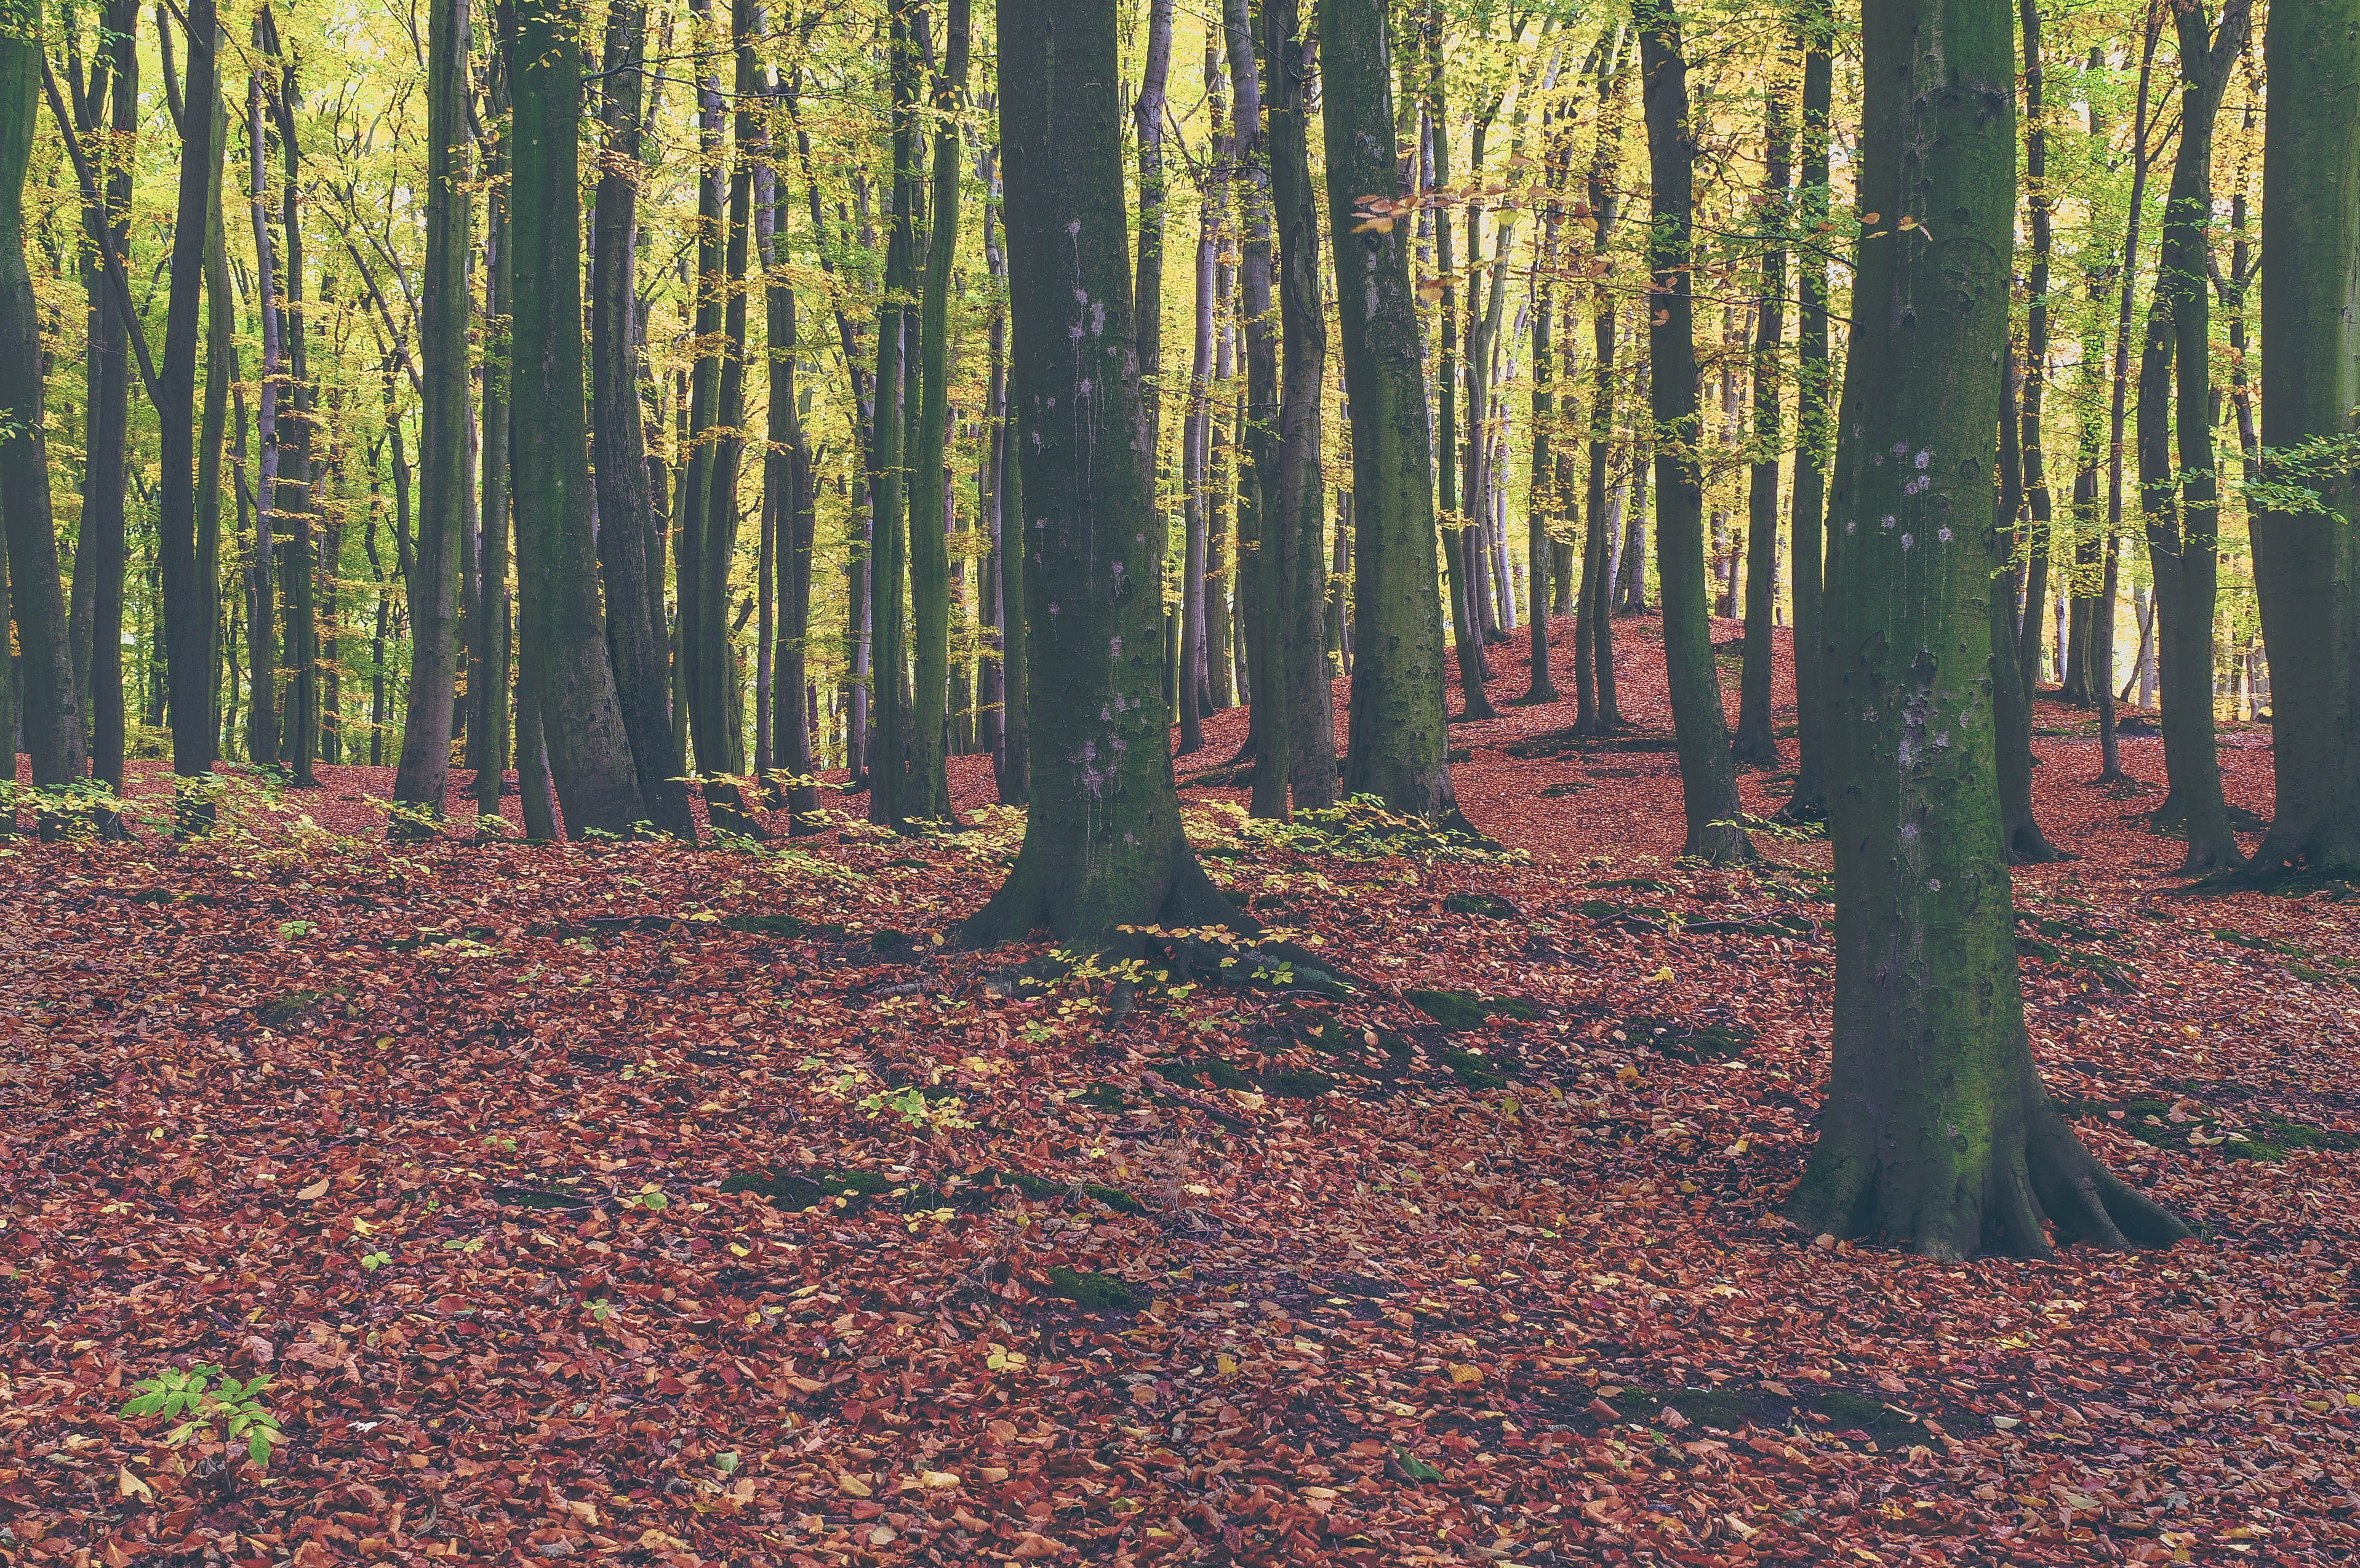 Wald, Wanderweg, Naturerlebnis, Bos, wandelpad, natuurbelevenis, wandelpad, natuurbelevenis, Forest, hiking trail, nature experience